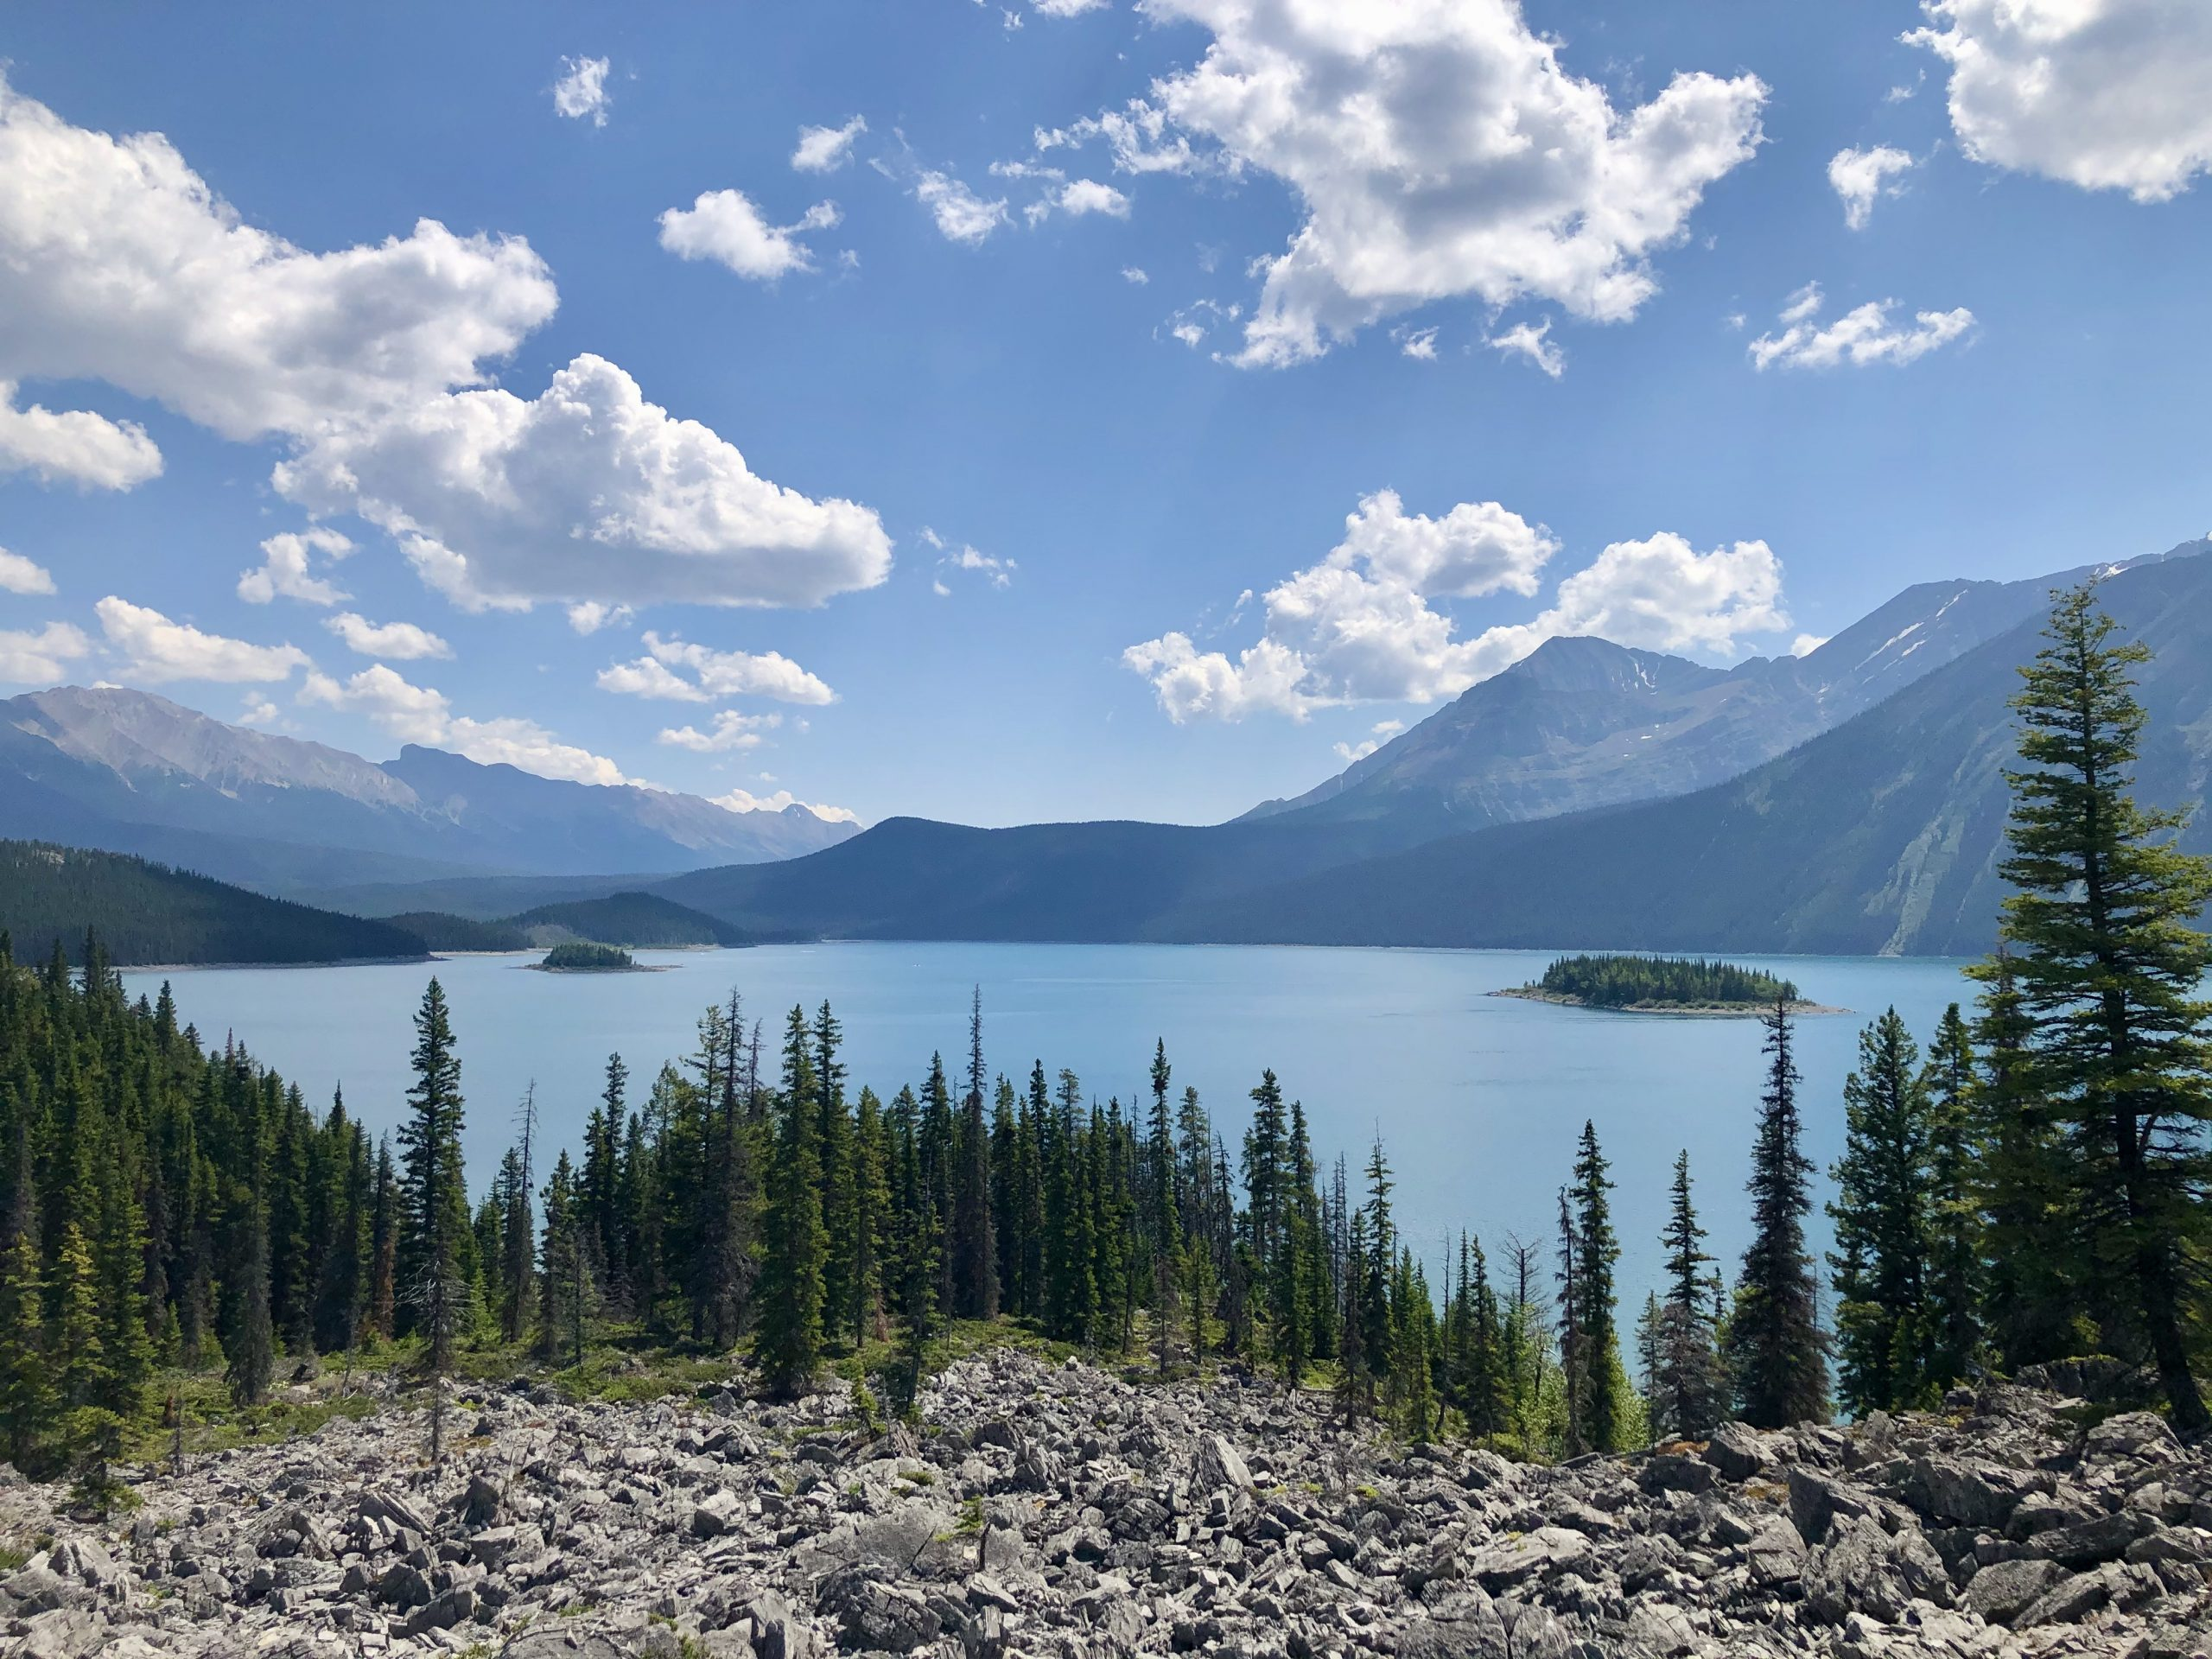 The Scenic Upper Kananaskis Lake Hike in Alberta via @outandacross